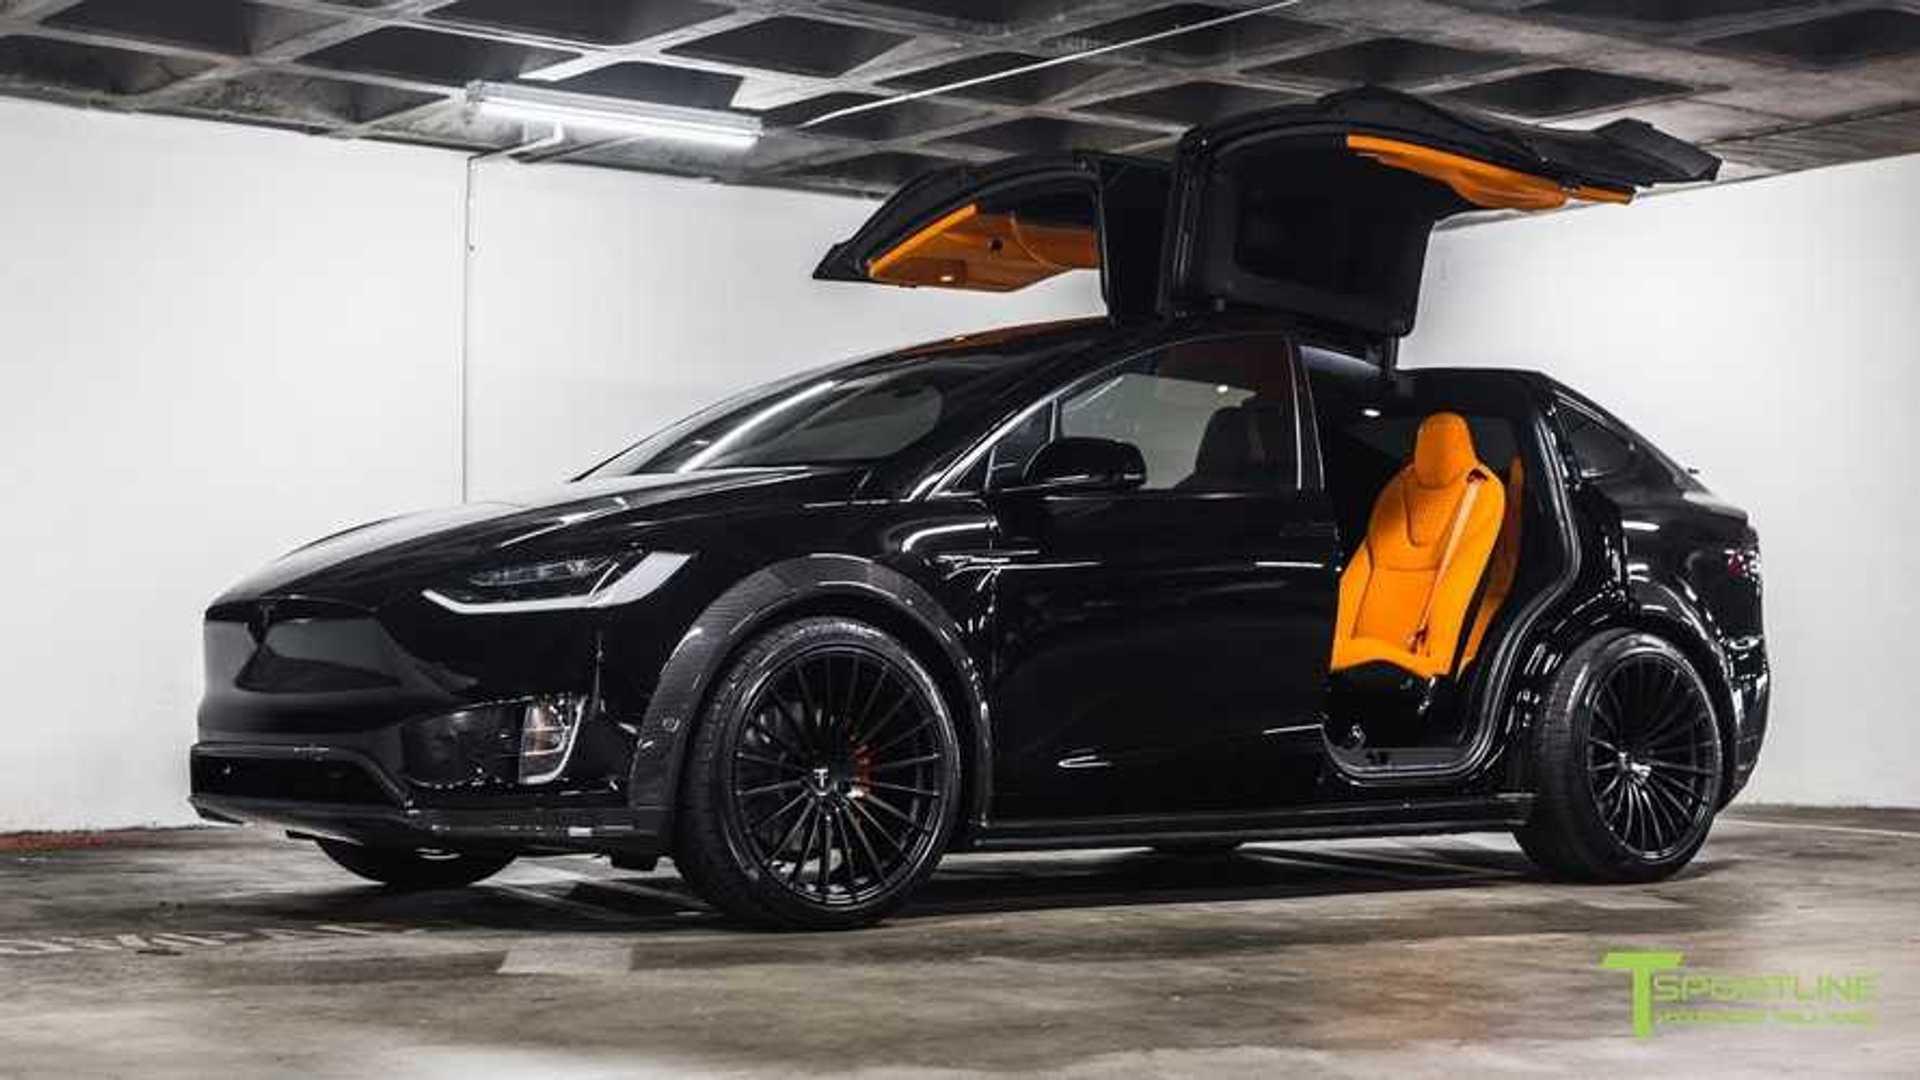 Check Out Tesla Model X Widebody With Orange Lamborghini Interior